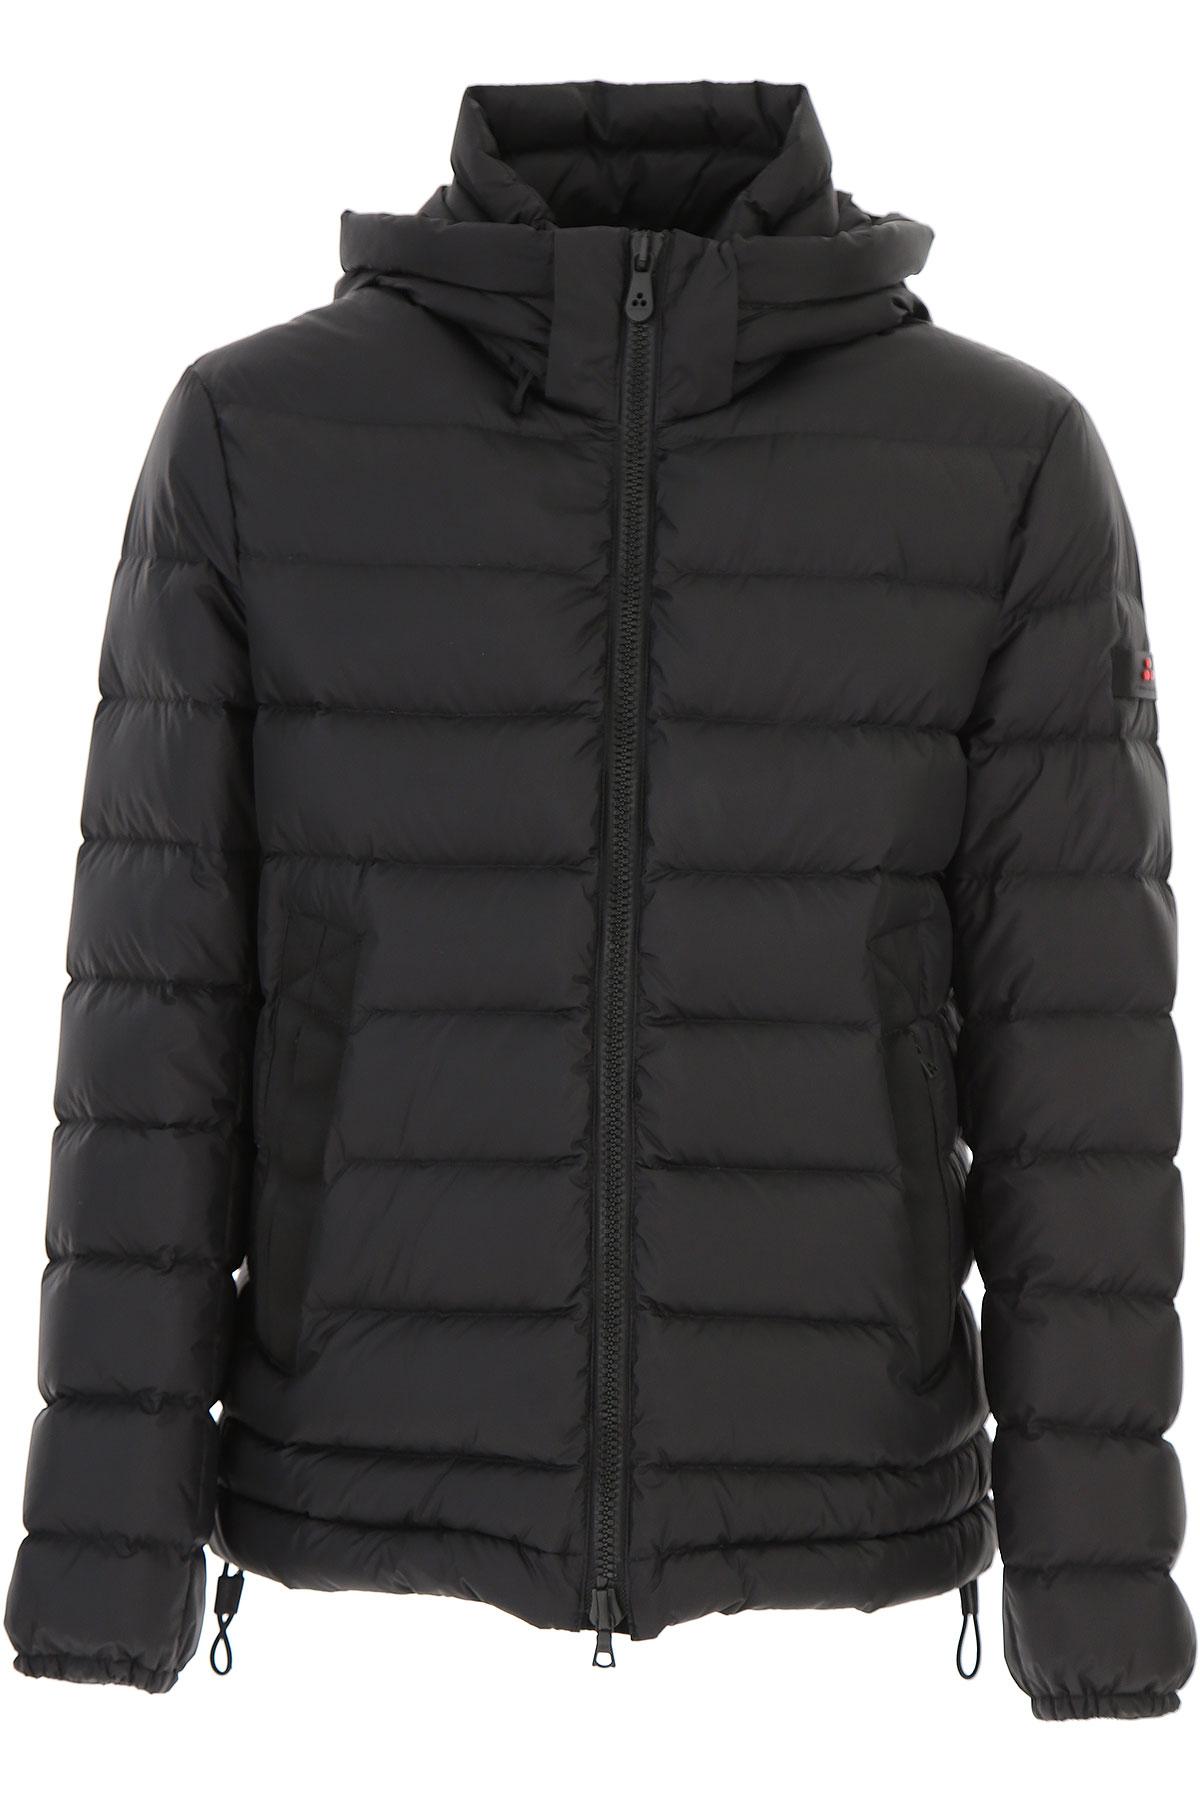 Image of Peuterey Down Jacket for Men, Puffer Ski Jacket, Black, polyamide, 2017, L M S XL XXL